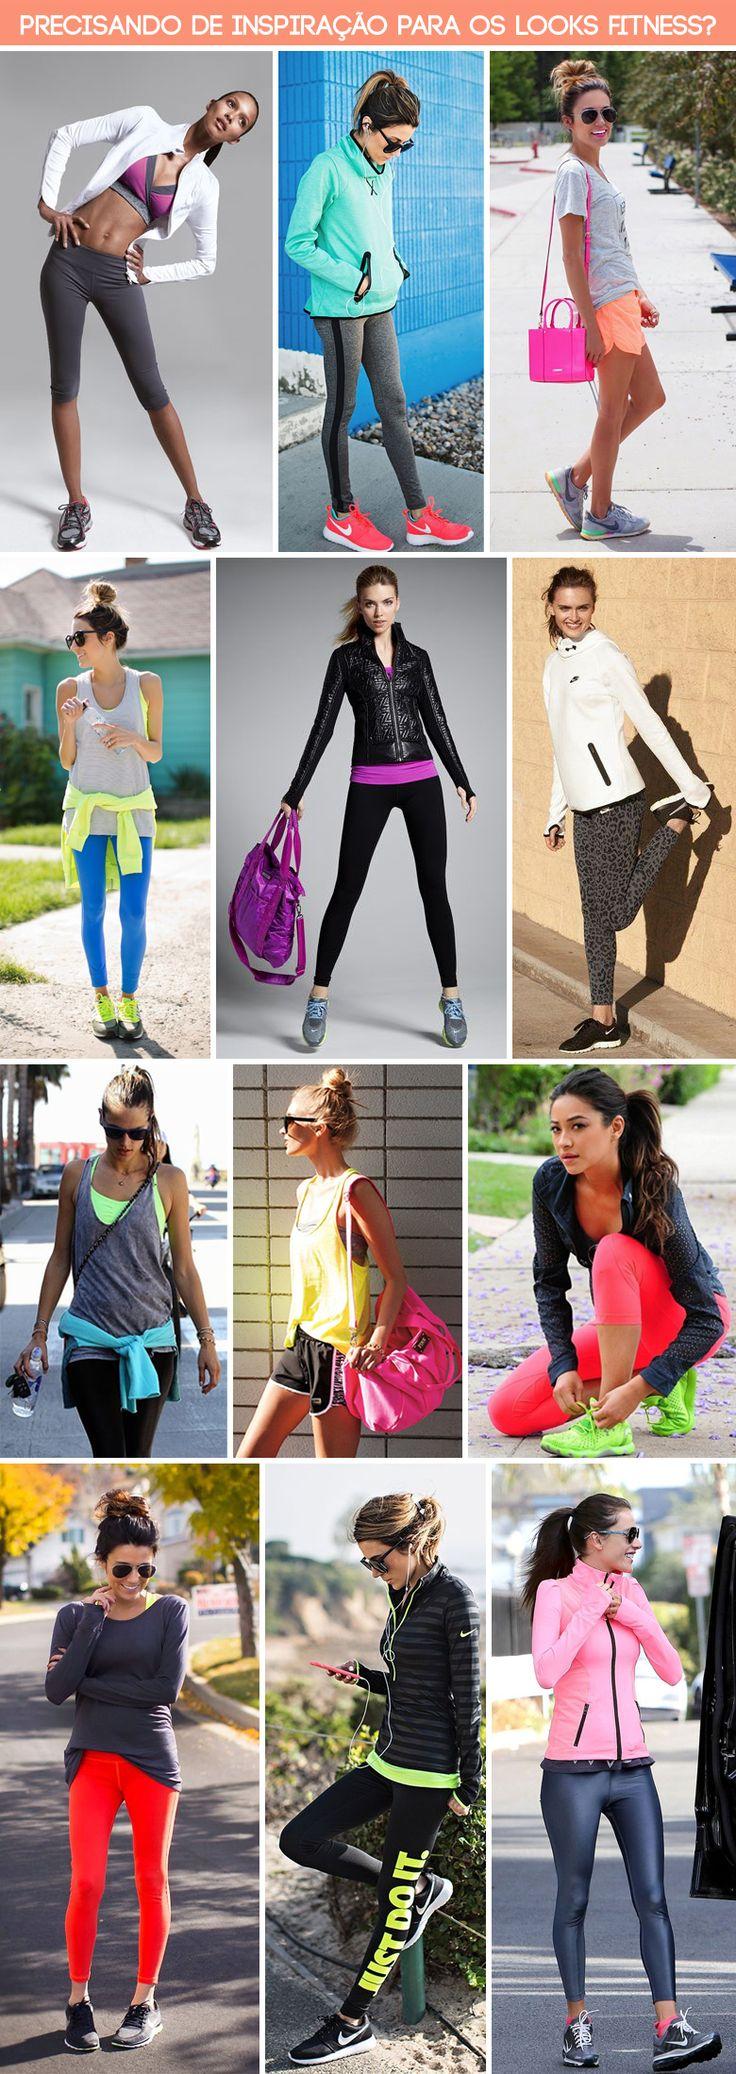 Estilo Meu - Consultoria de Imagem / gym style / fitness style / stylish fitness / get in shape / malhando / look da academia / roupas fitness